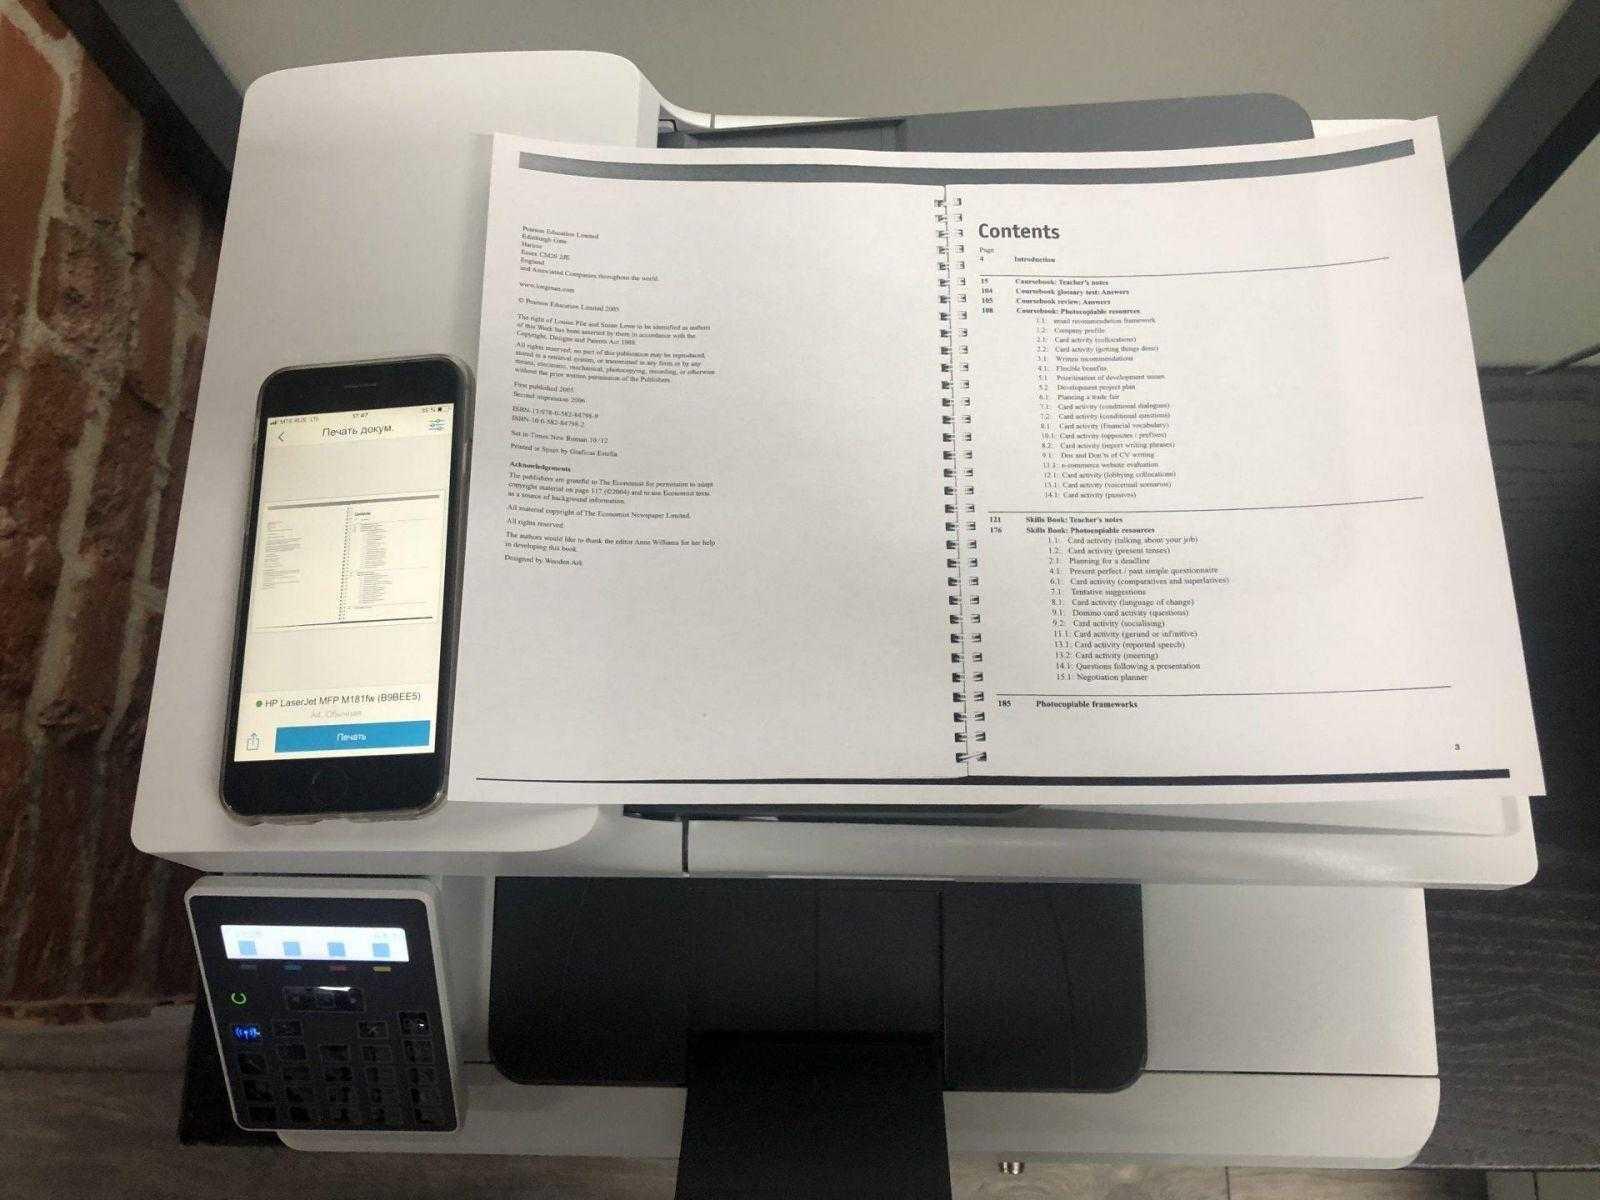 Идеален для офиса. Обзор МФУ HP Color LaserJet Pro M181fw (img 87571 1)